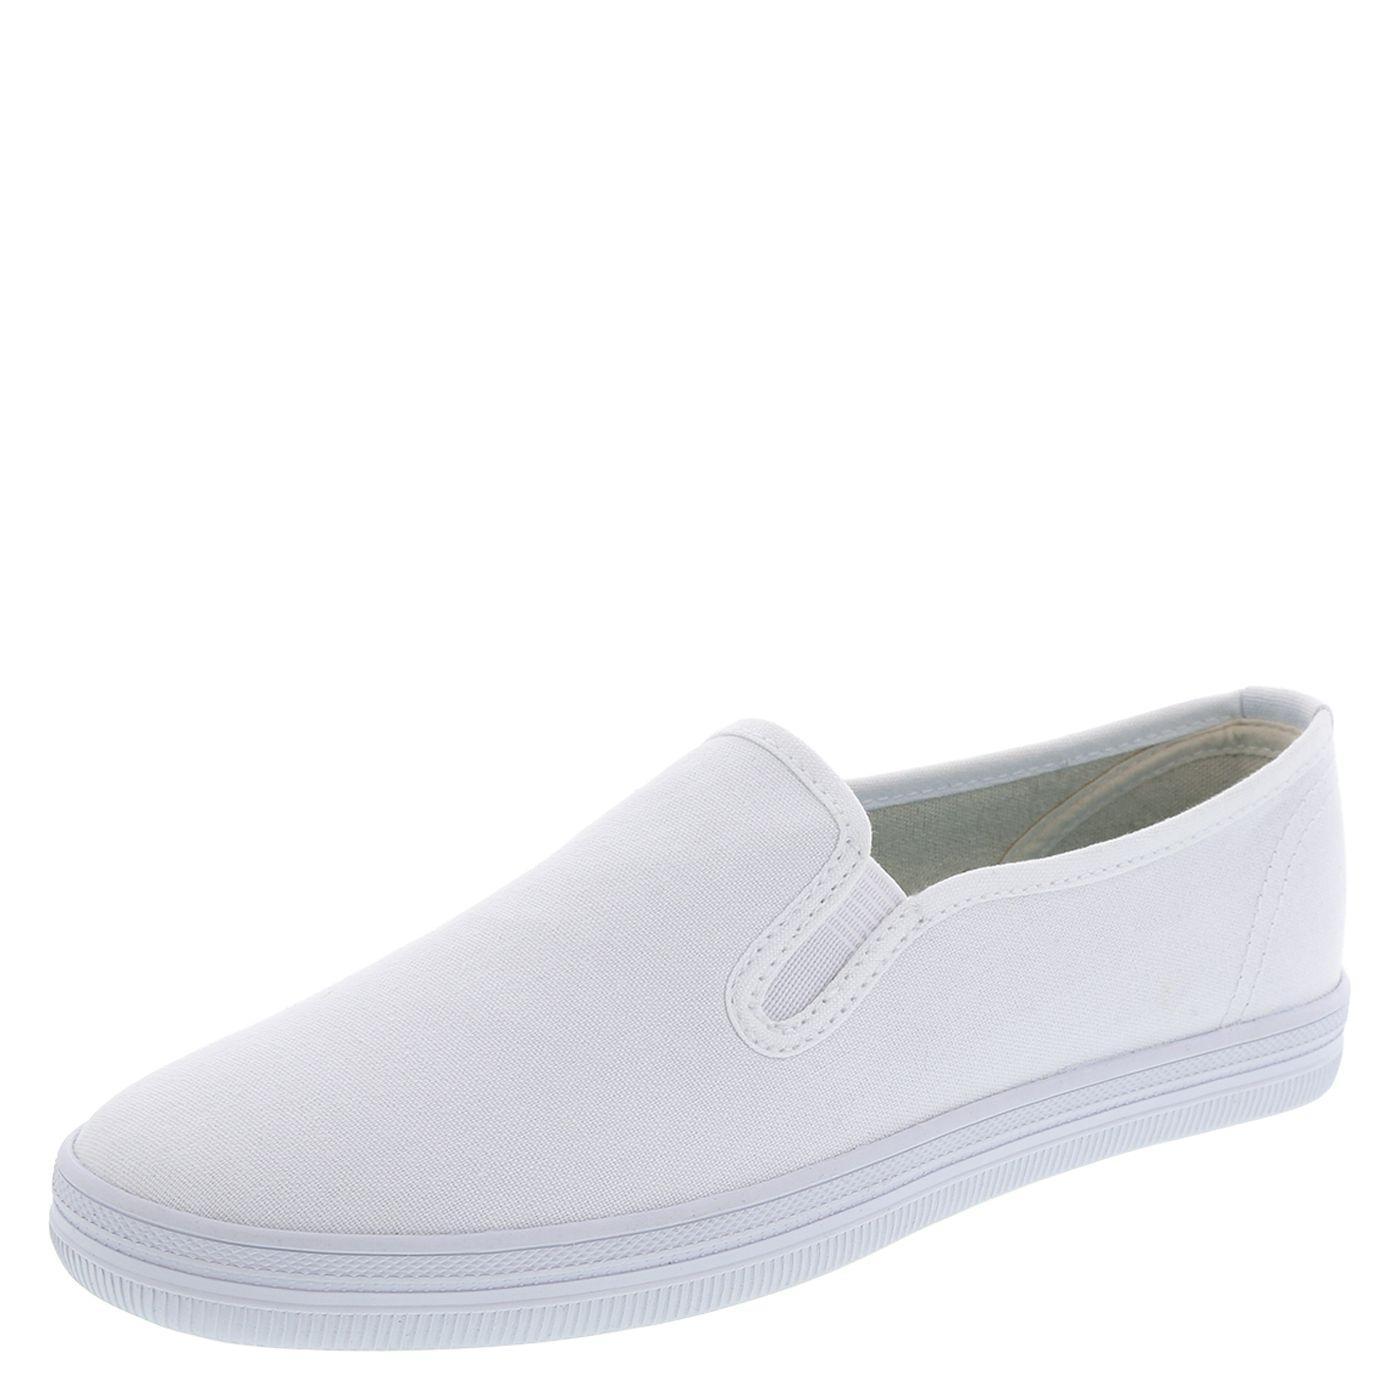 white slip on gym shoes